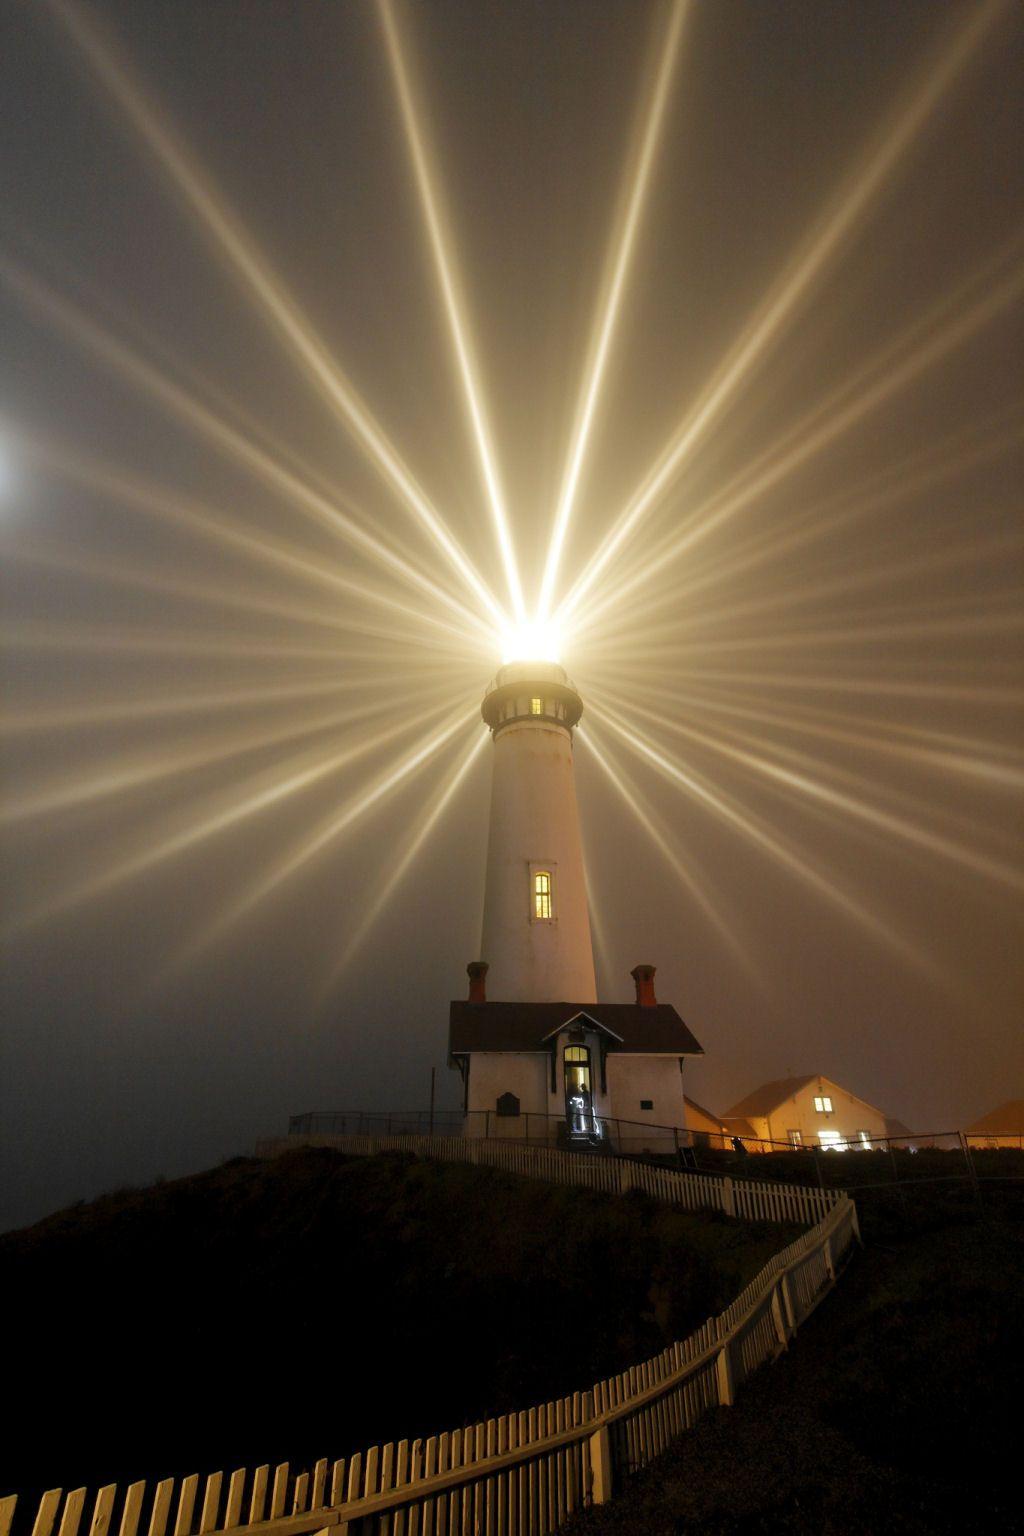 Pigeon Point Lighthouse, California | Leuchtturm bilder, Leuchtturm, Licht in der dunkelheit